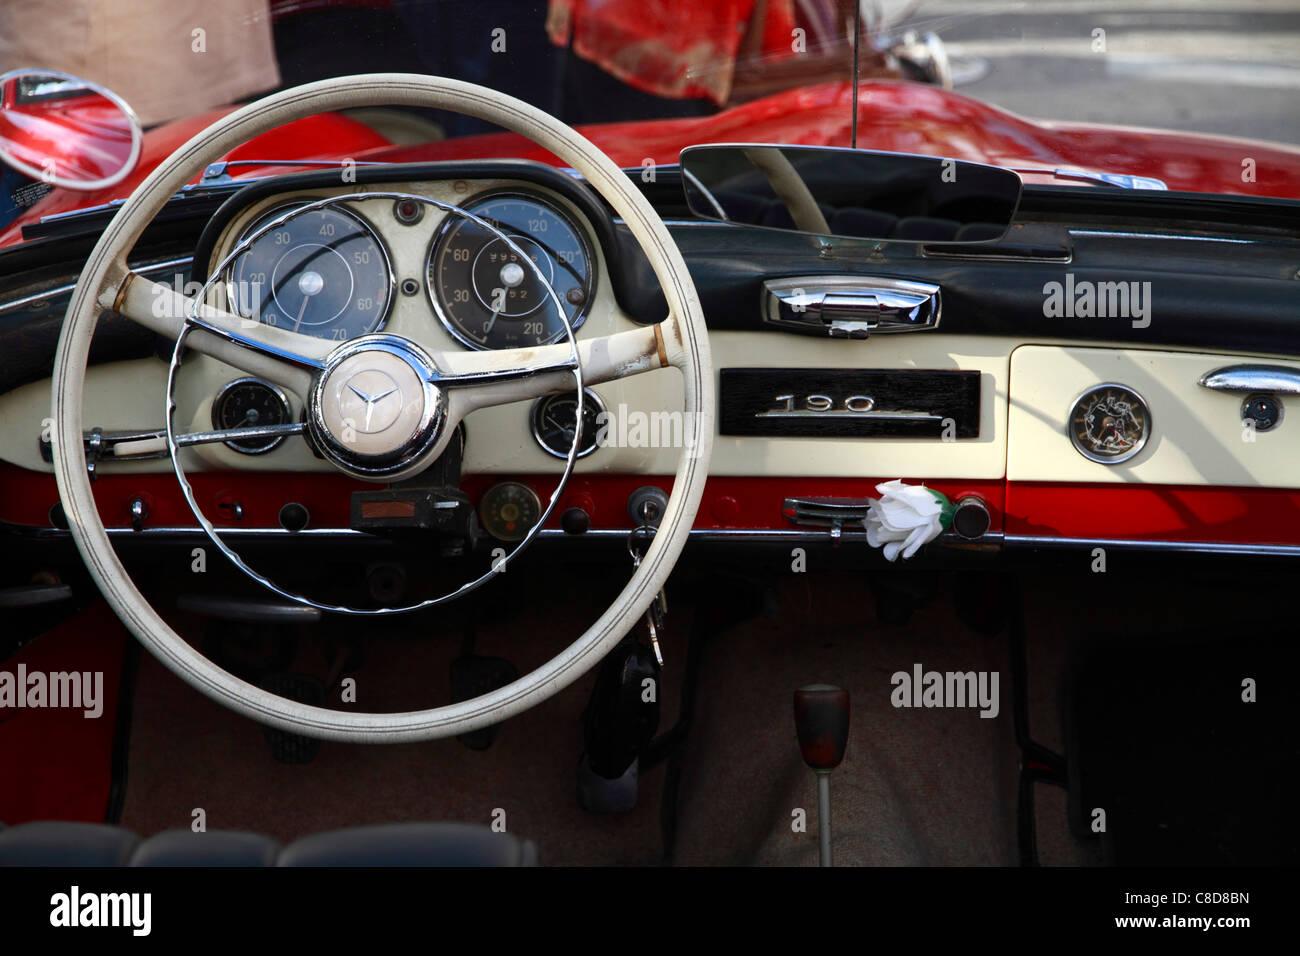 Mercedes Benz 190, cockpit detail - Stock Image